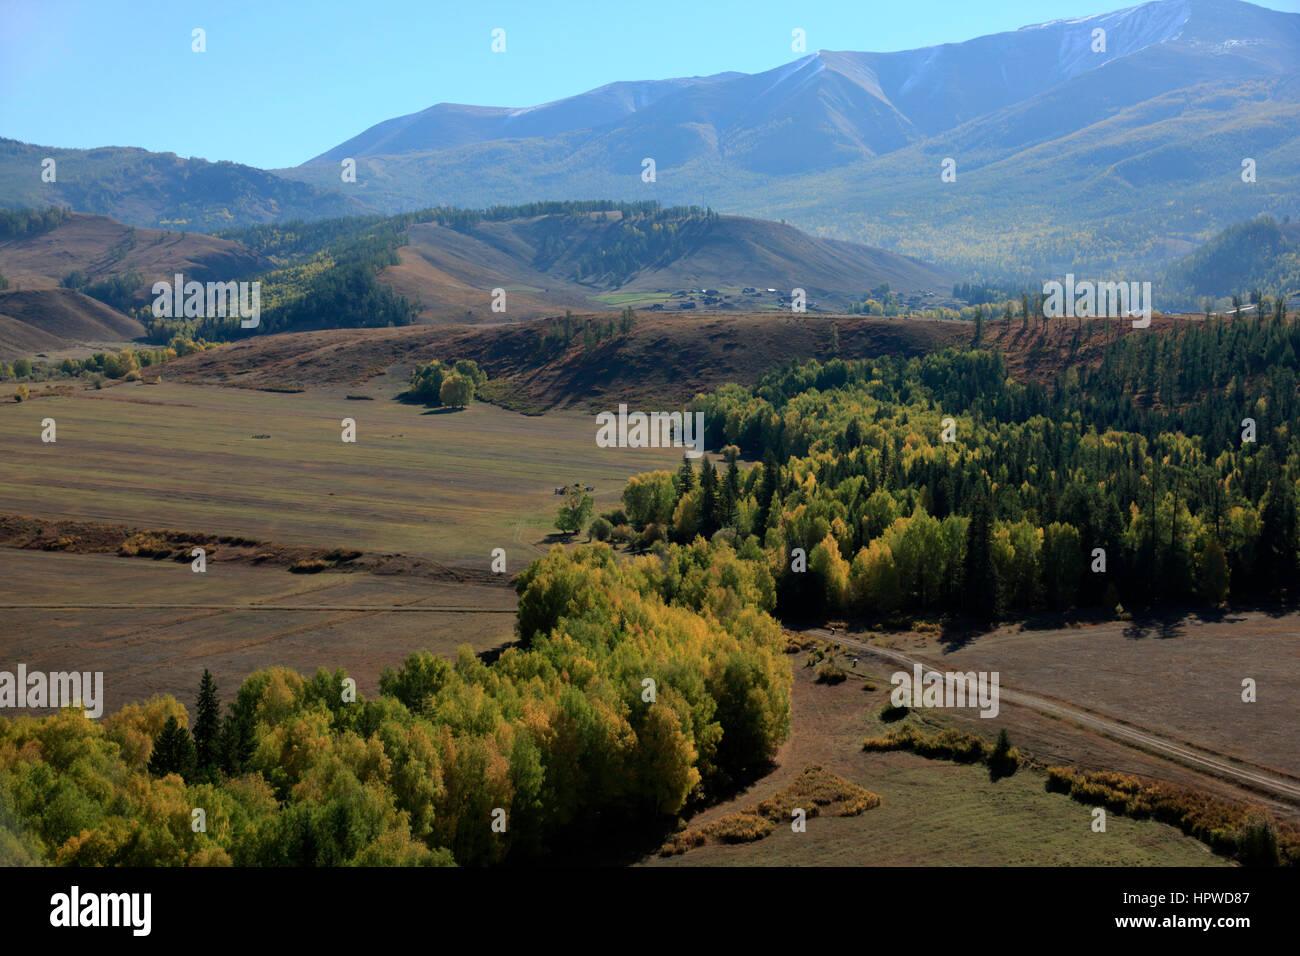 Valley near Burqin - Stock Image